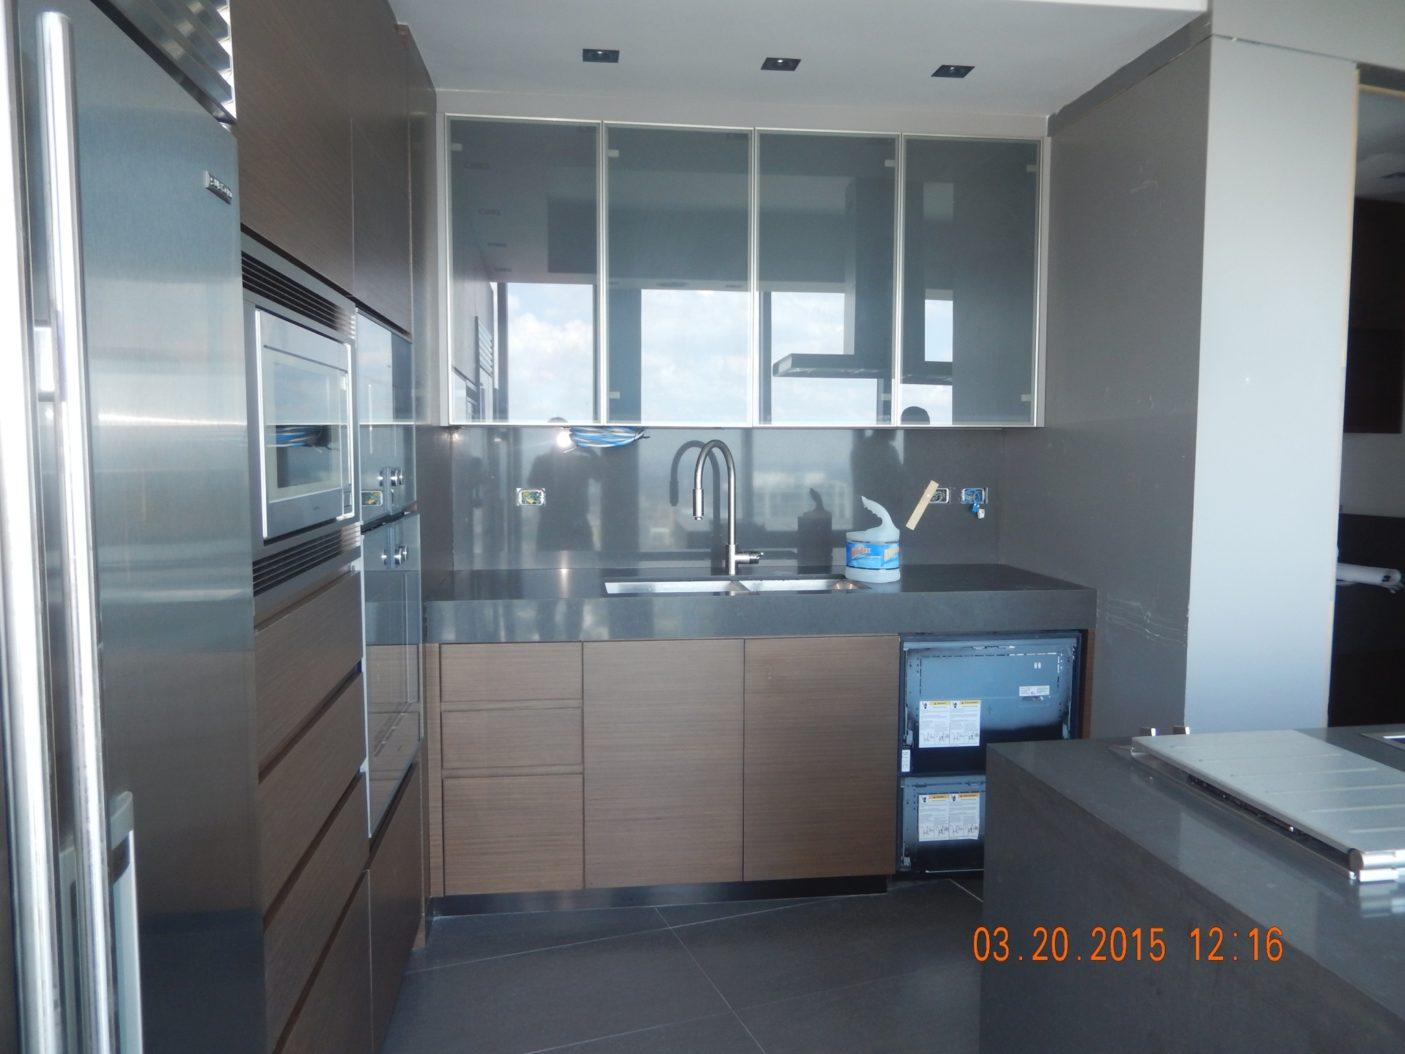 Kitchens-148.jpg